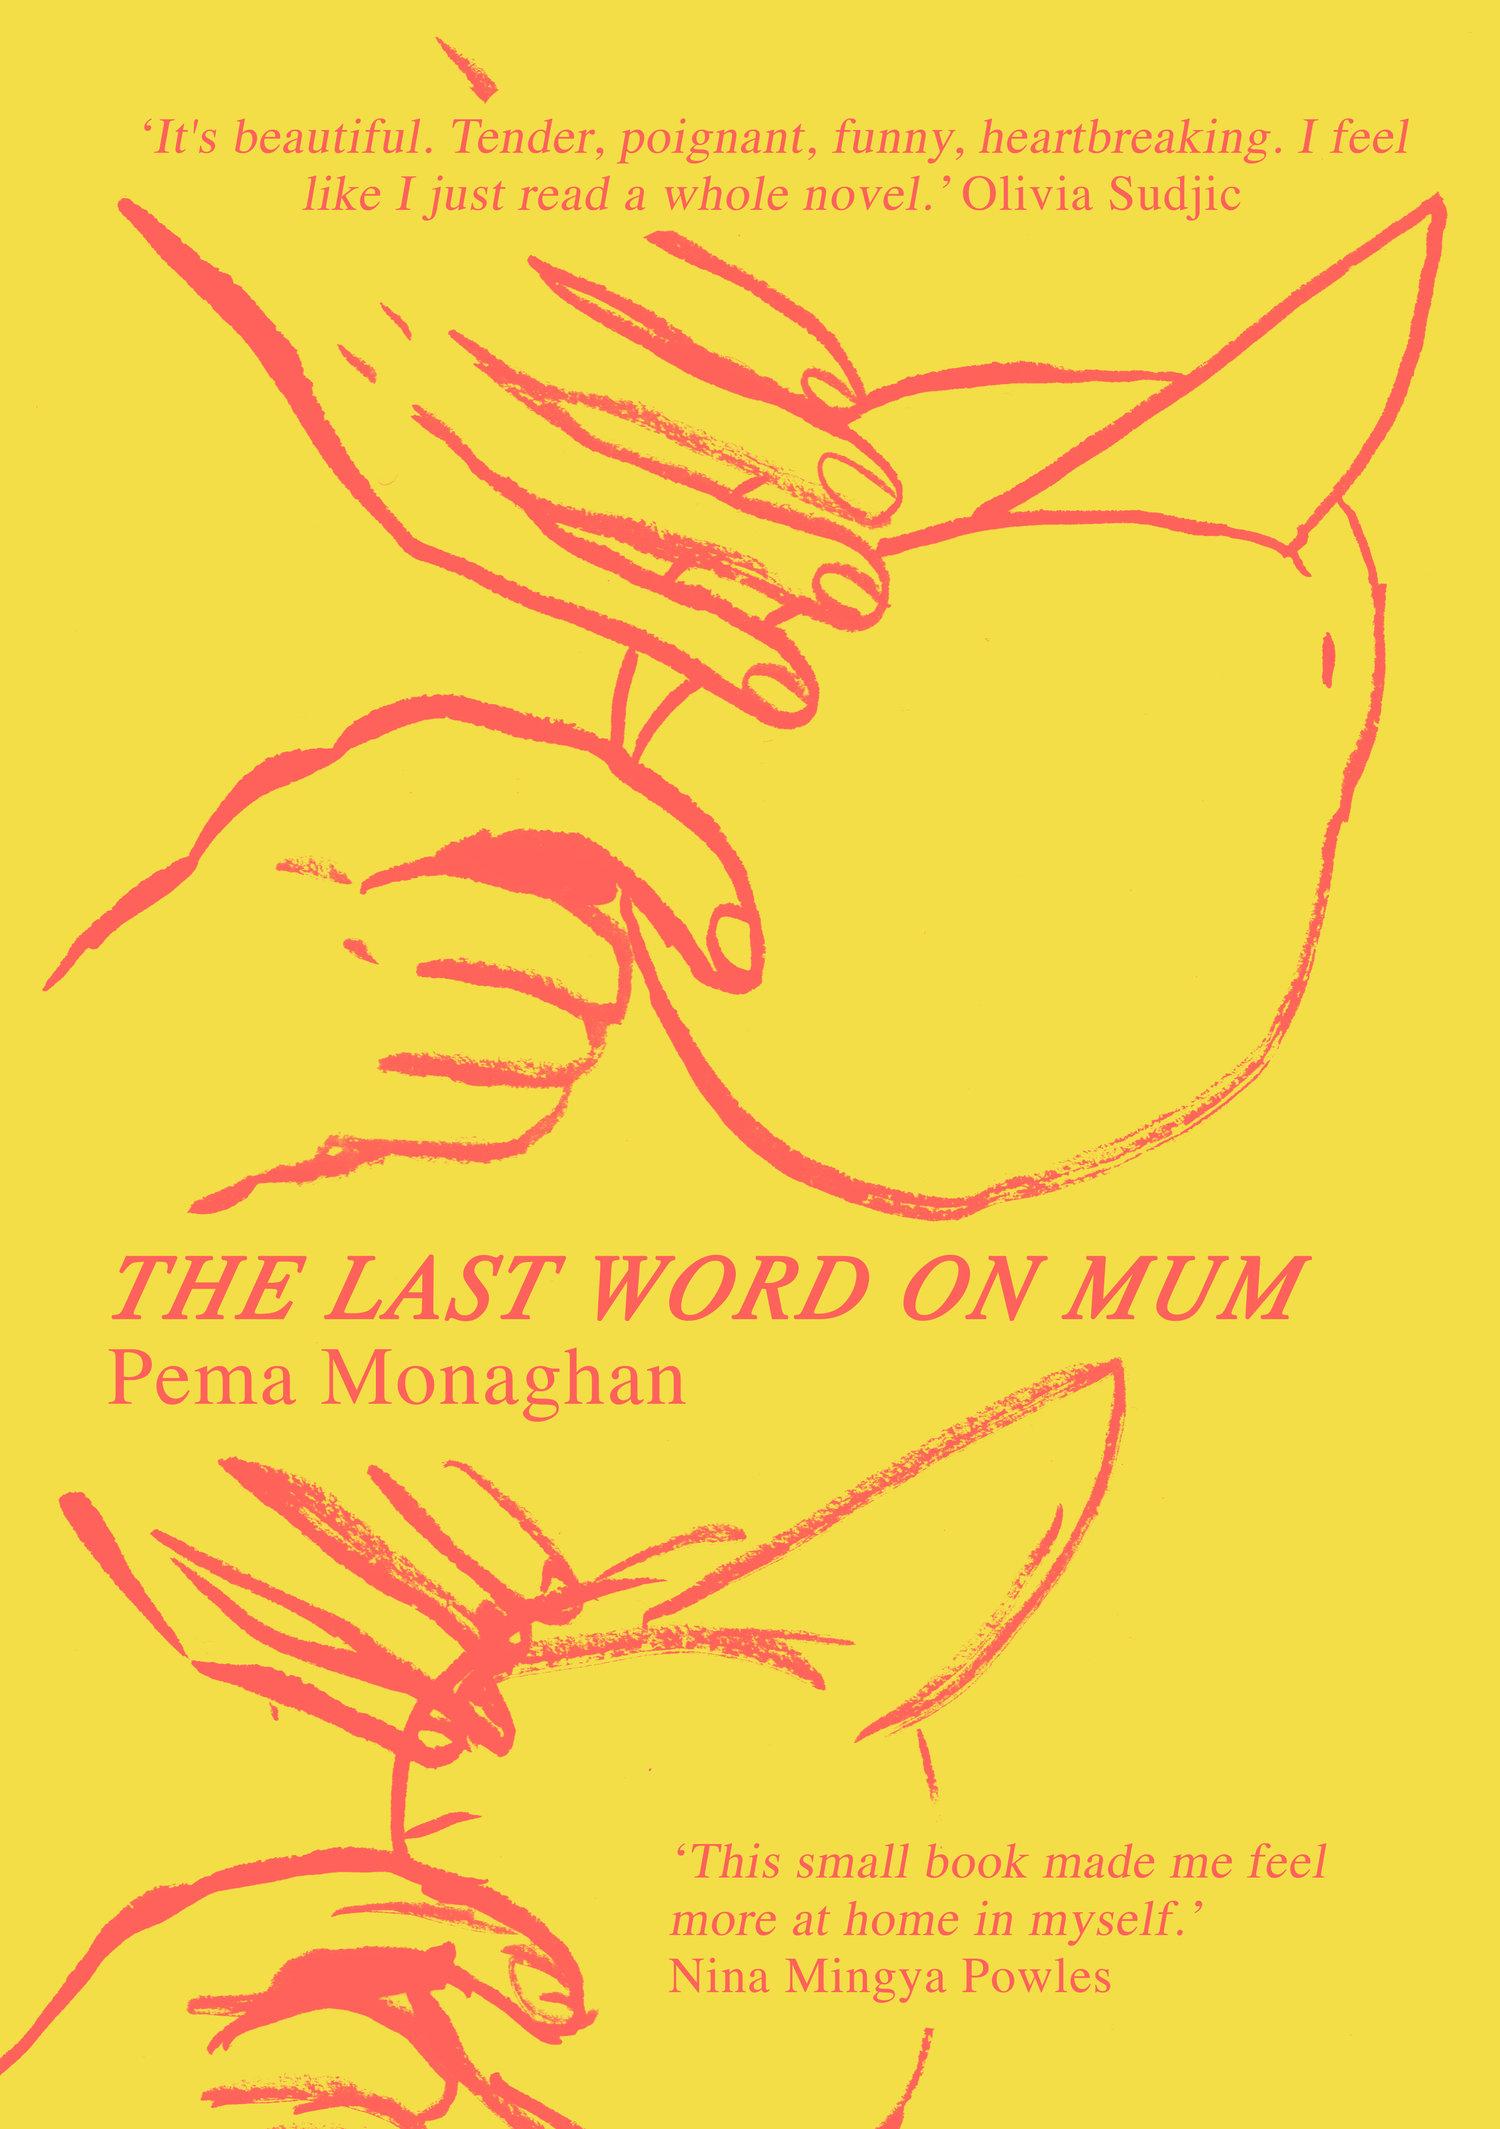 Pema Monaghan – The Last Word on Mum